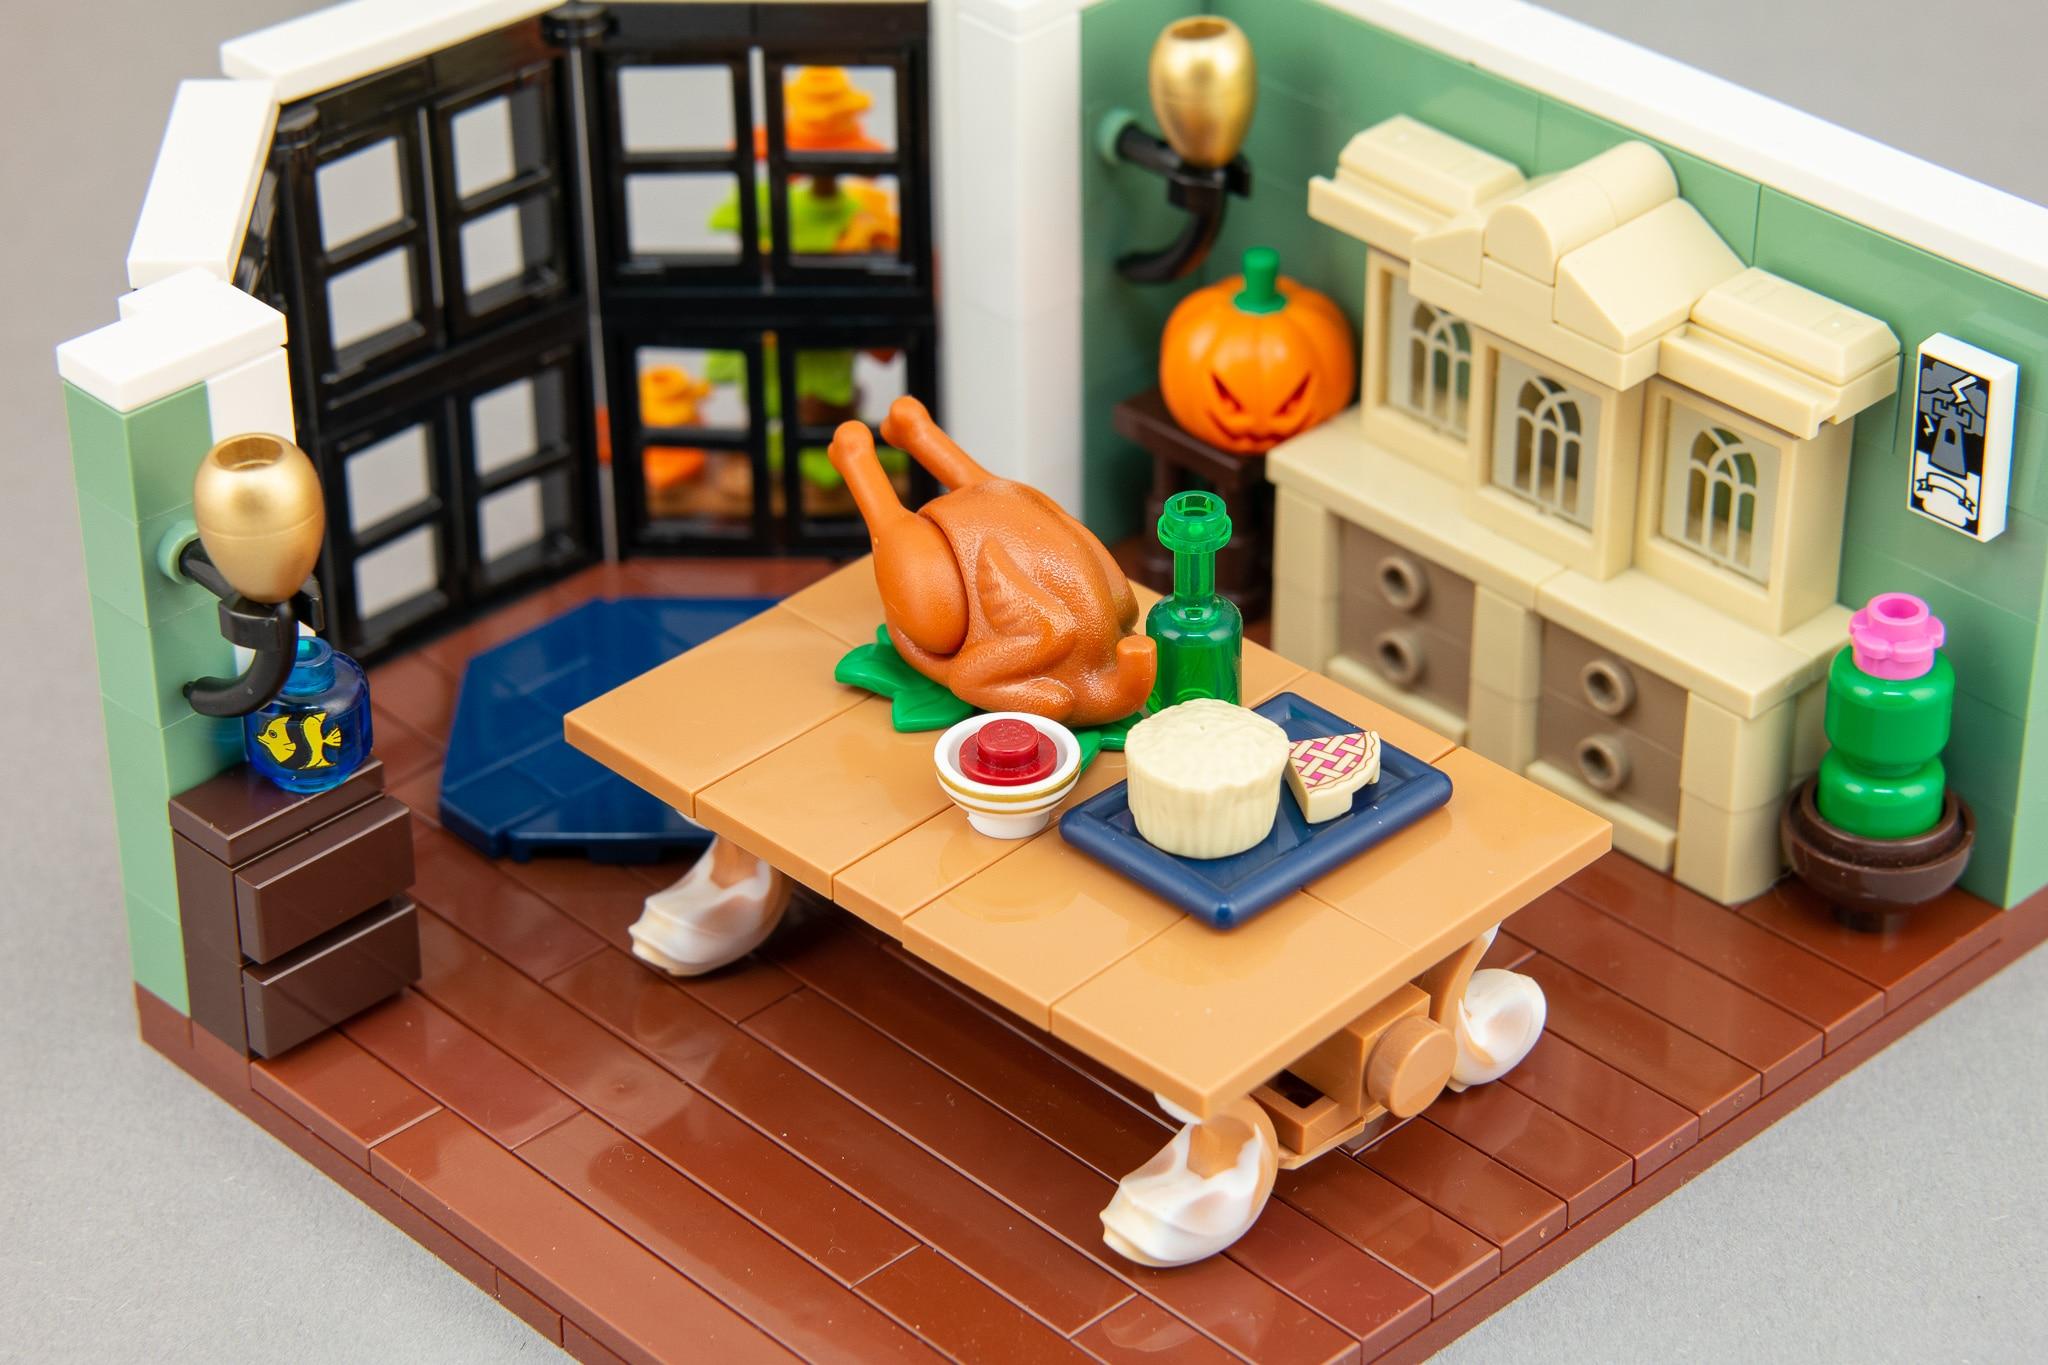 LEGO Moc Bausinpiration Esszimmer (8)